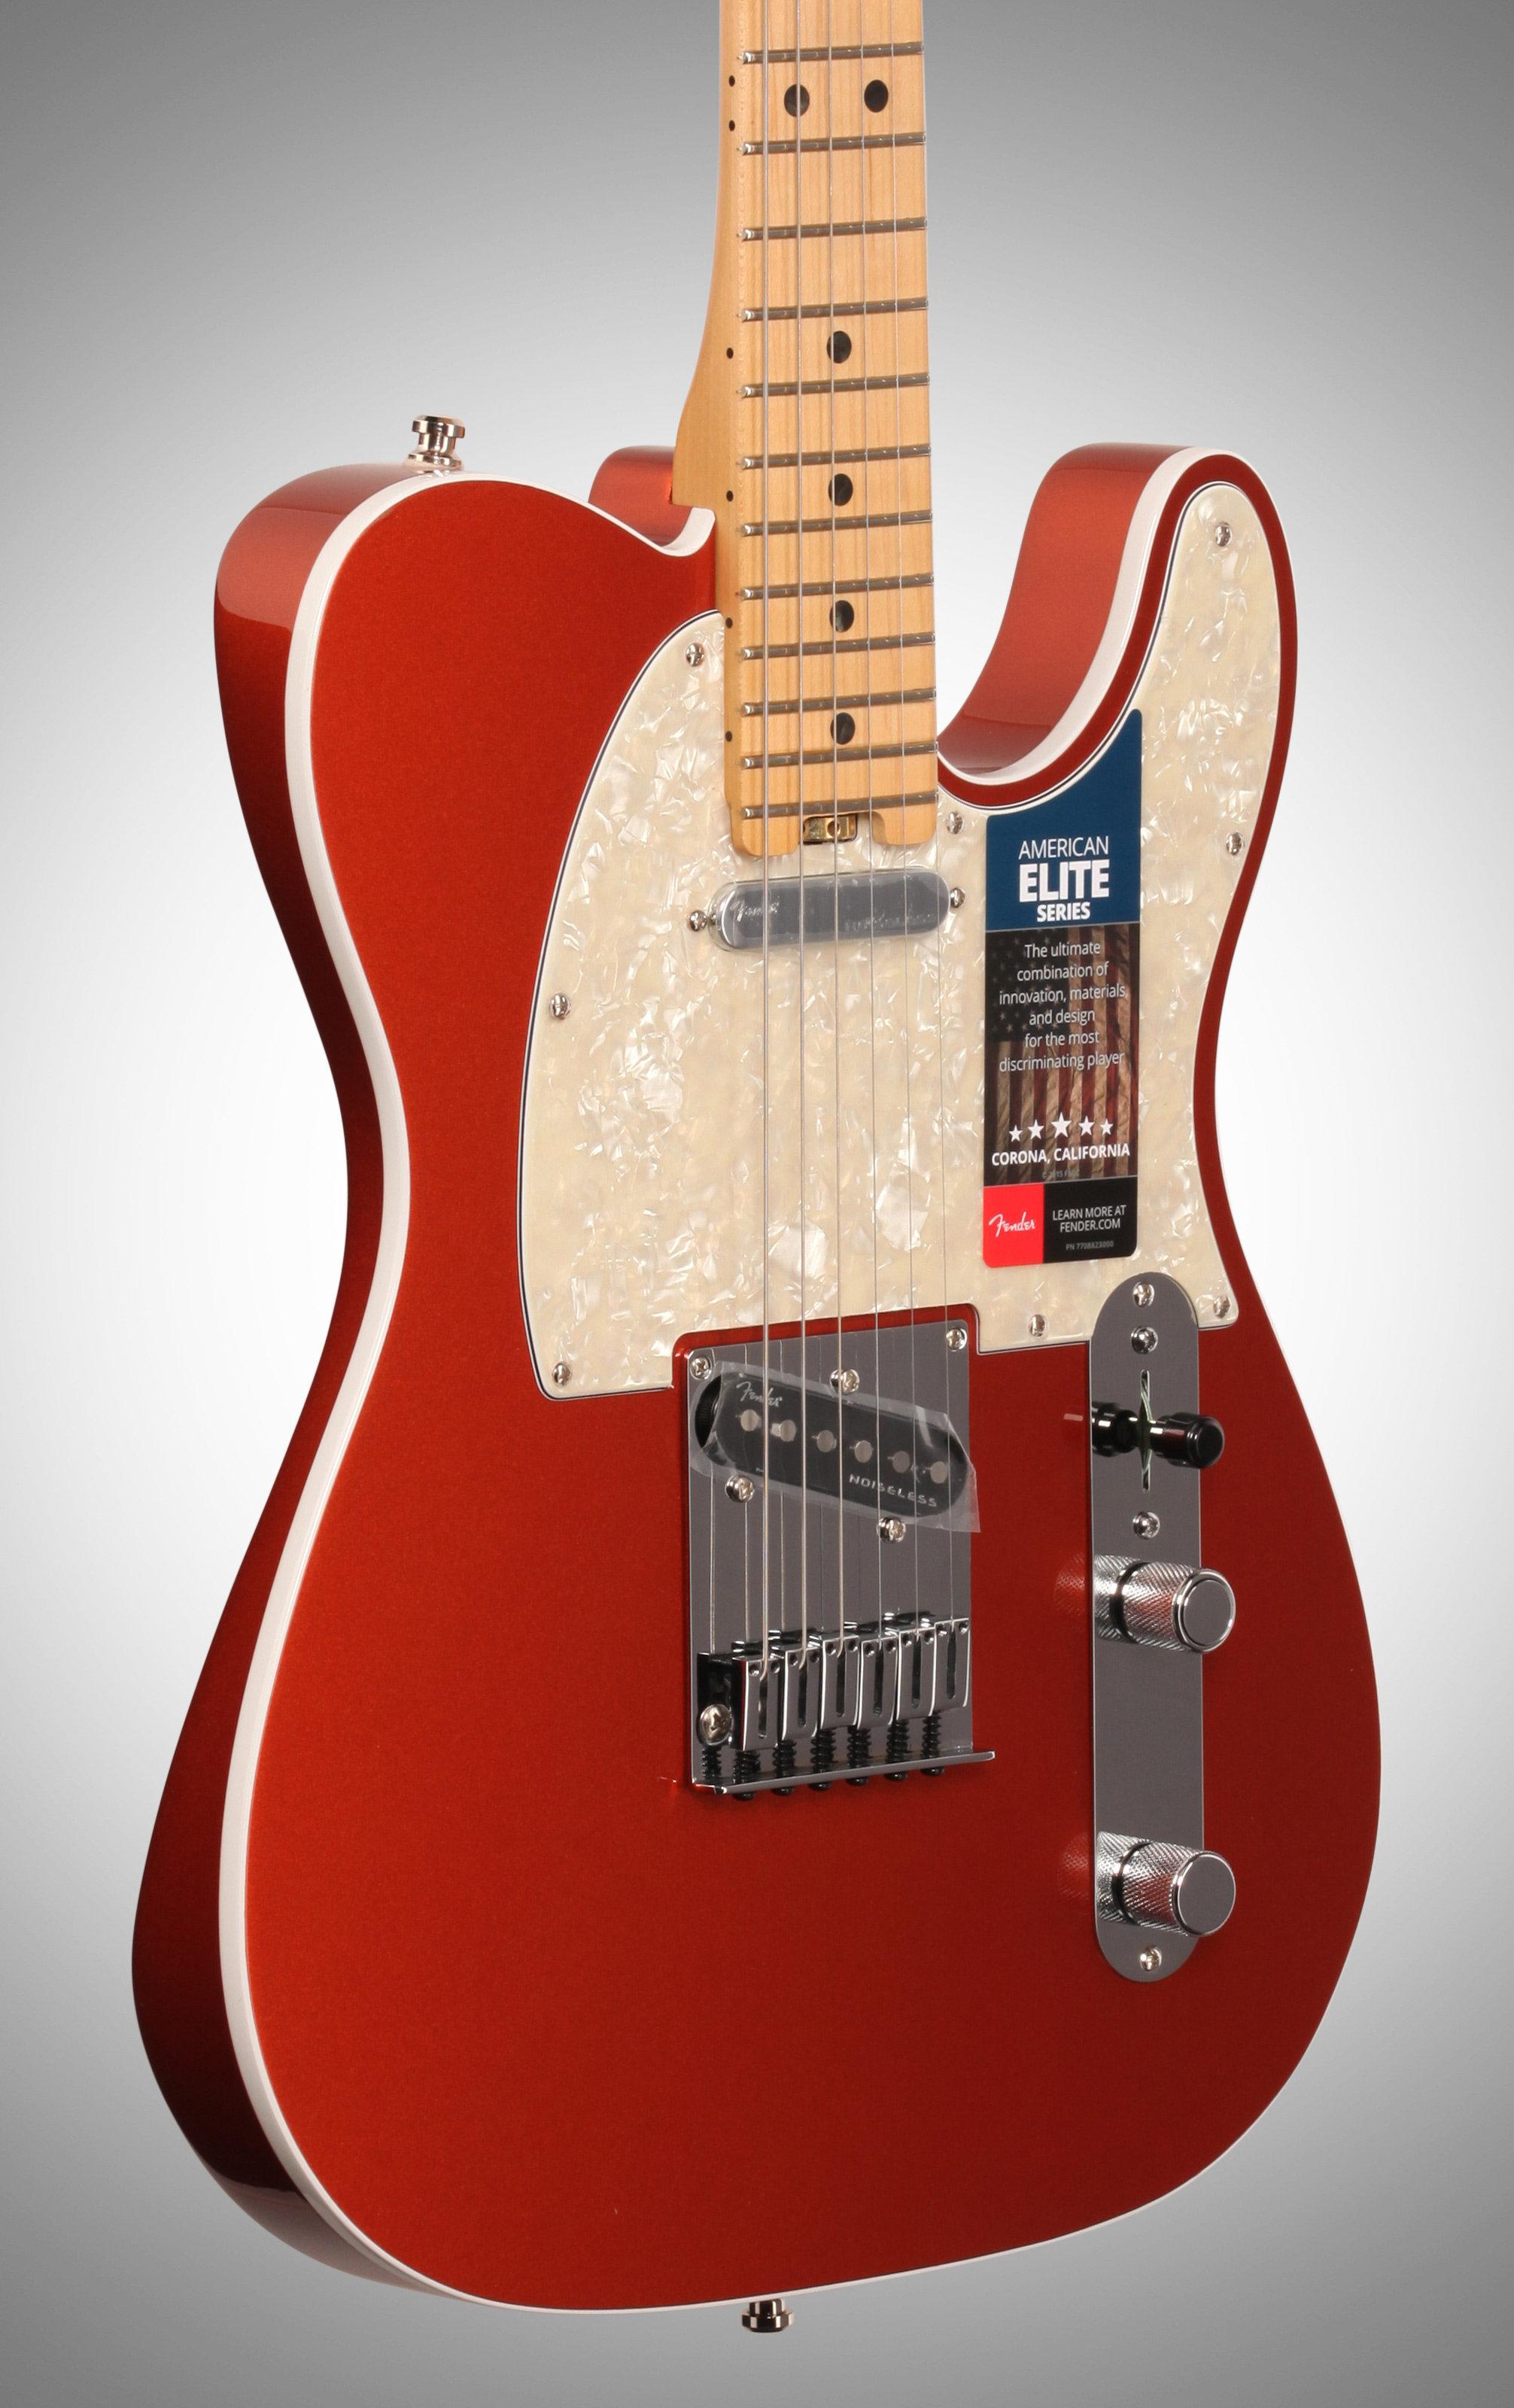 fender telecaster s1 wiring diagram car relay american elite electric guitar maple